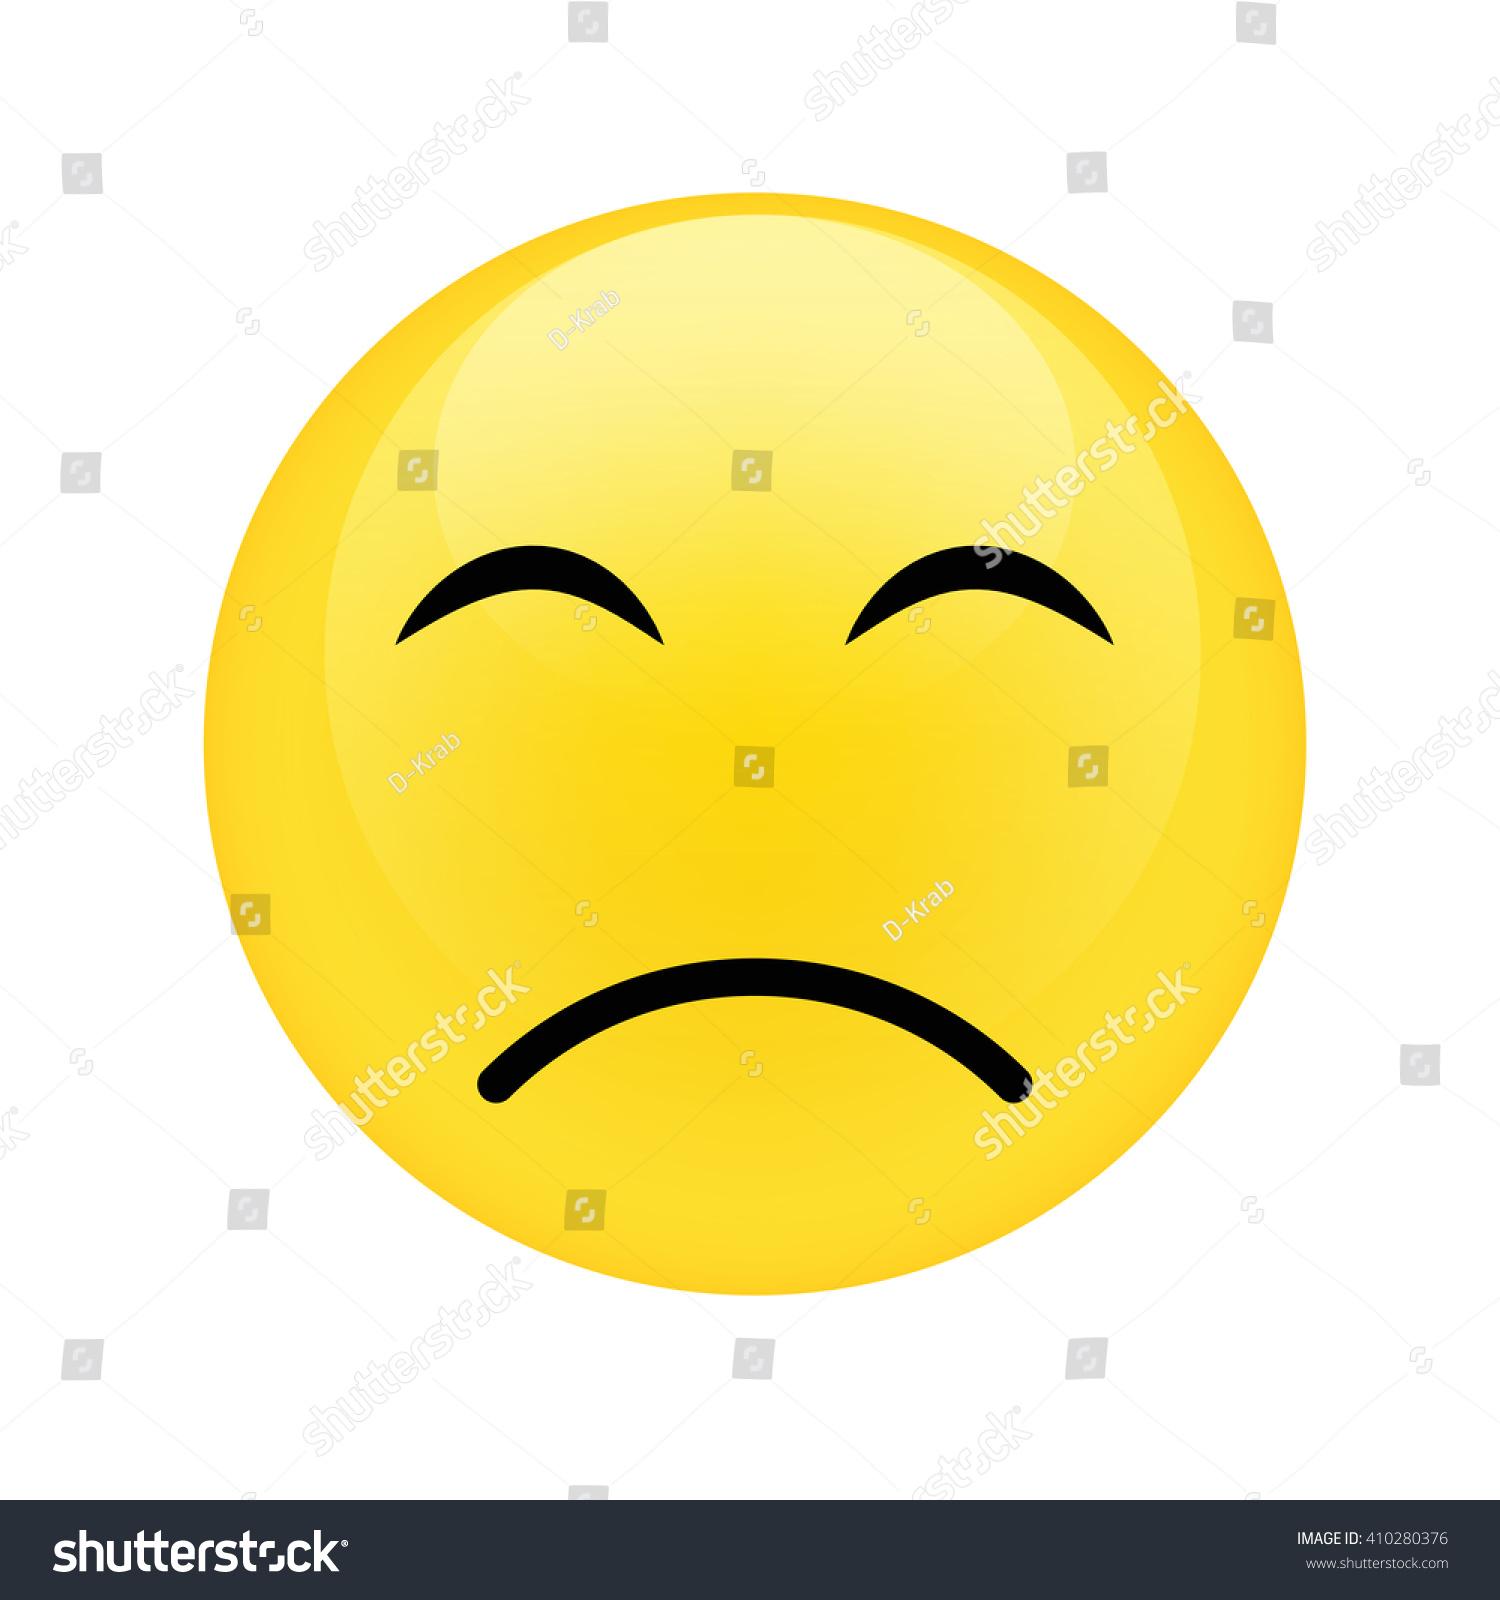 Symbol icon yellow unhappy face vector stock vector 410280376 symbol and icon of yellow unhappy face vector illustration buycottarizona Gallery